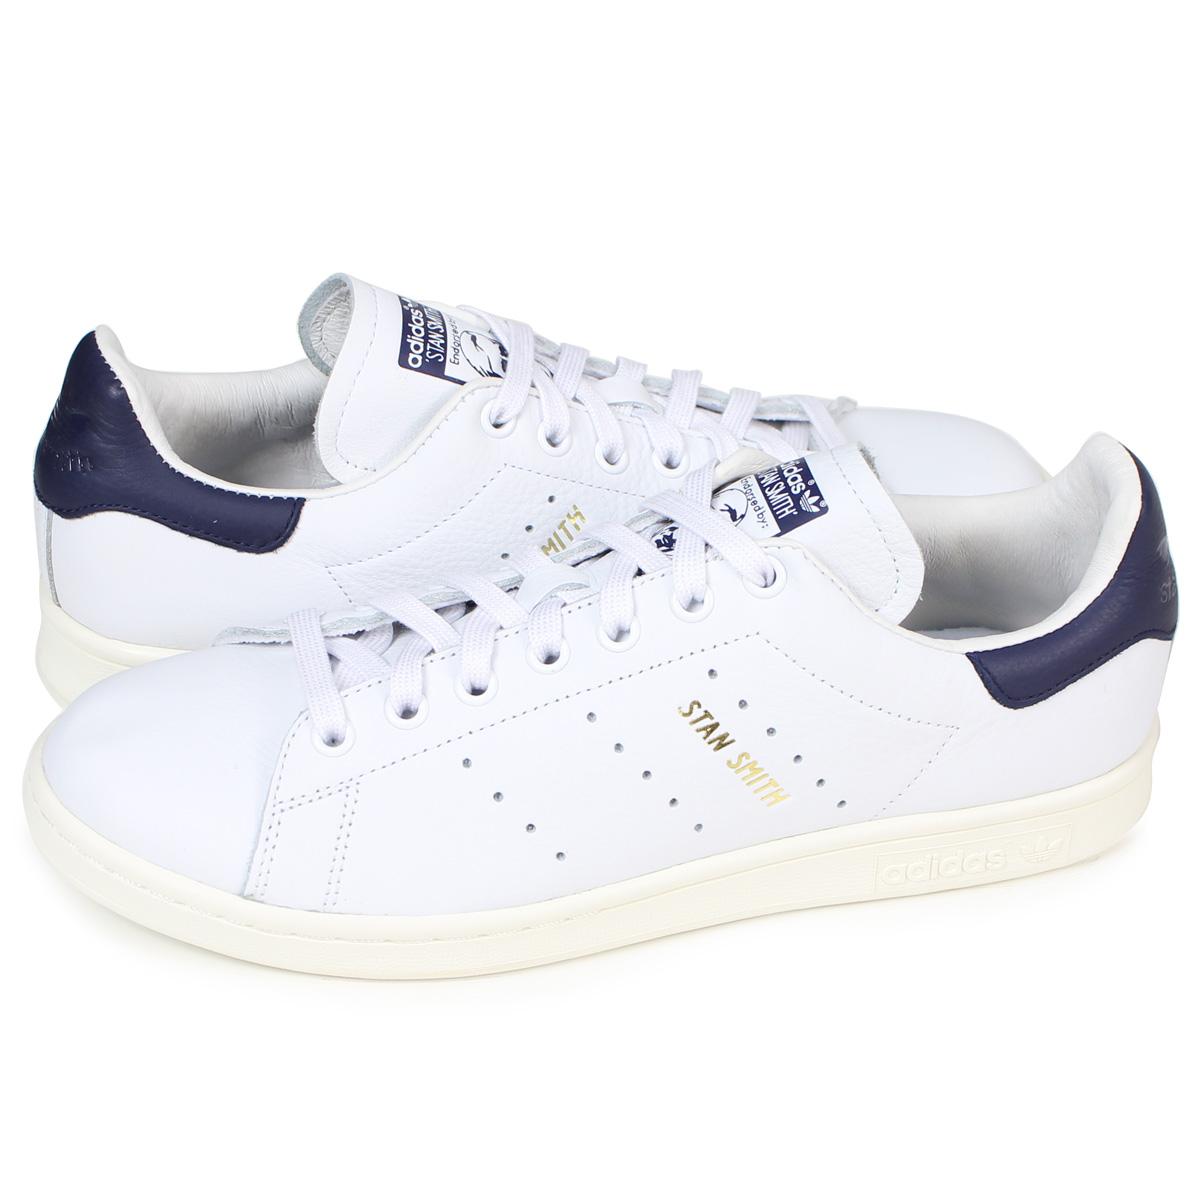 adidas Originals Stan Smith Shoes  JD Sports